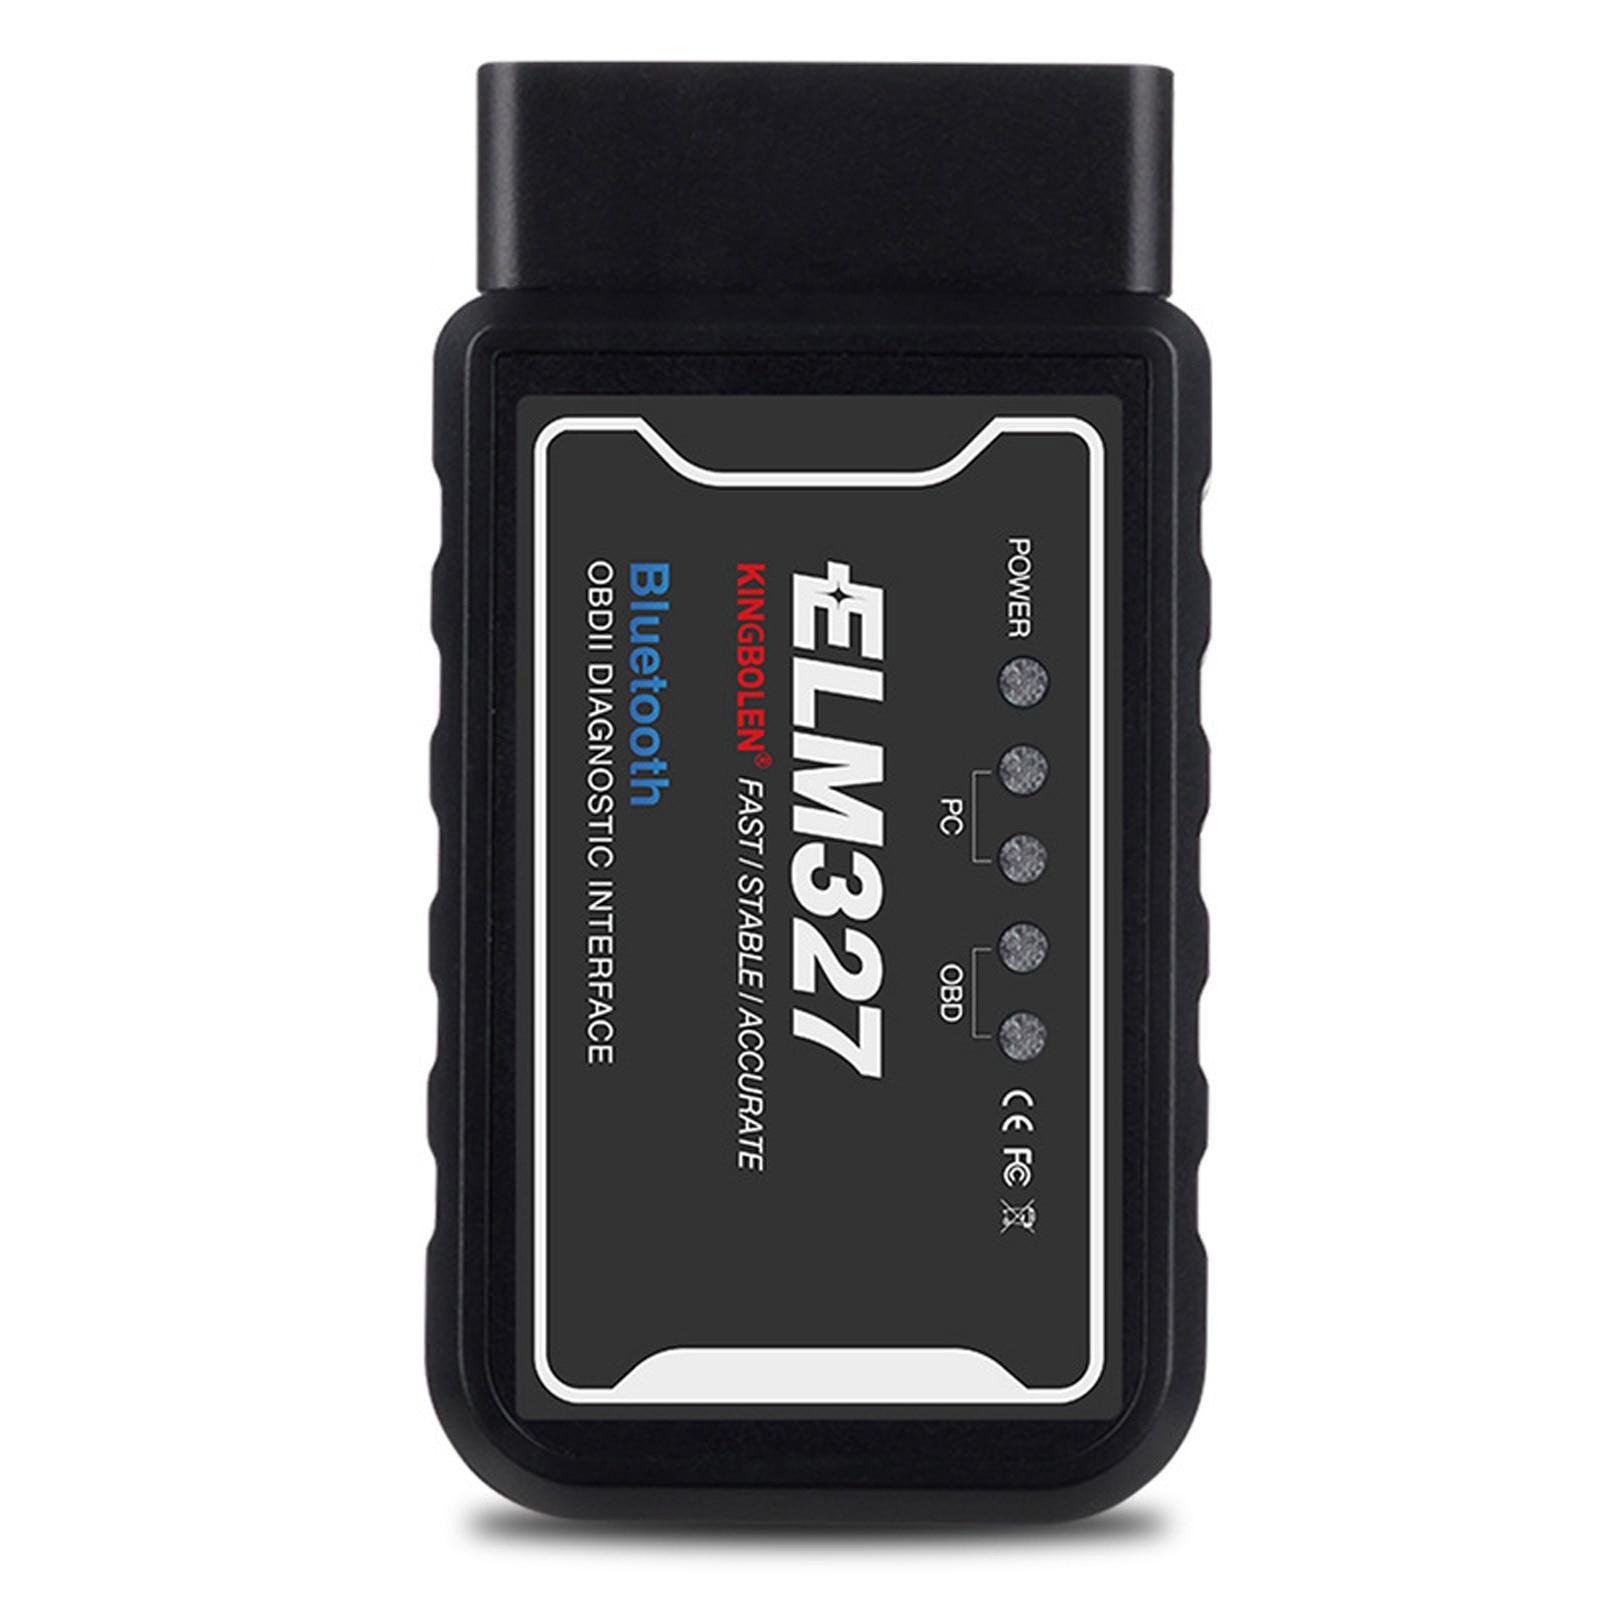 original v1 5 elm327 bluetooth adapter pic18f25k80 eml327 obd2 1 5 for android pc works with forscan elm 327 obd2 1 5 in russian ELM327 Bluetooth V1.5 PIC18F25K80 Chip Kingbolen ELM 327 OBD2 Diagnostic Tool For Android Elm327 v1.5 Auto Scanner Code Reader